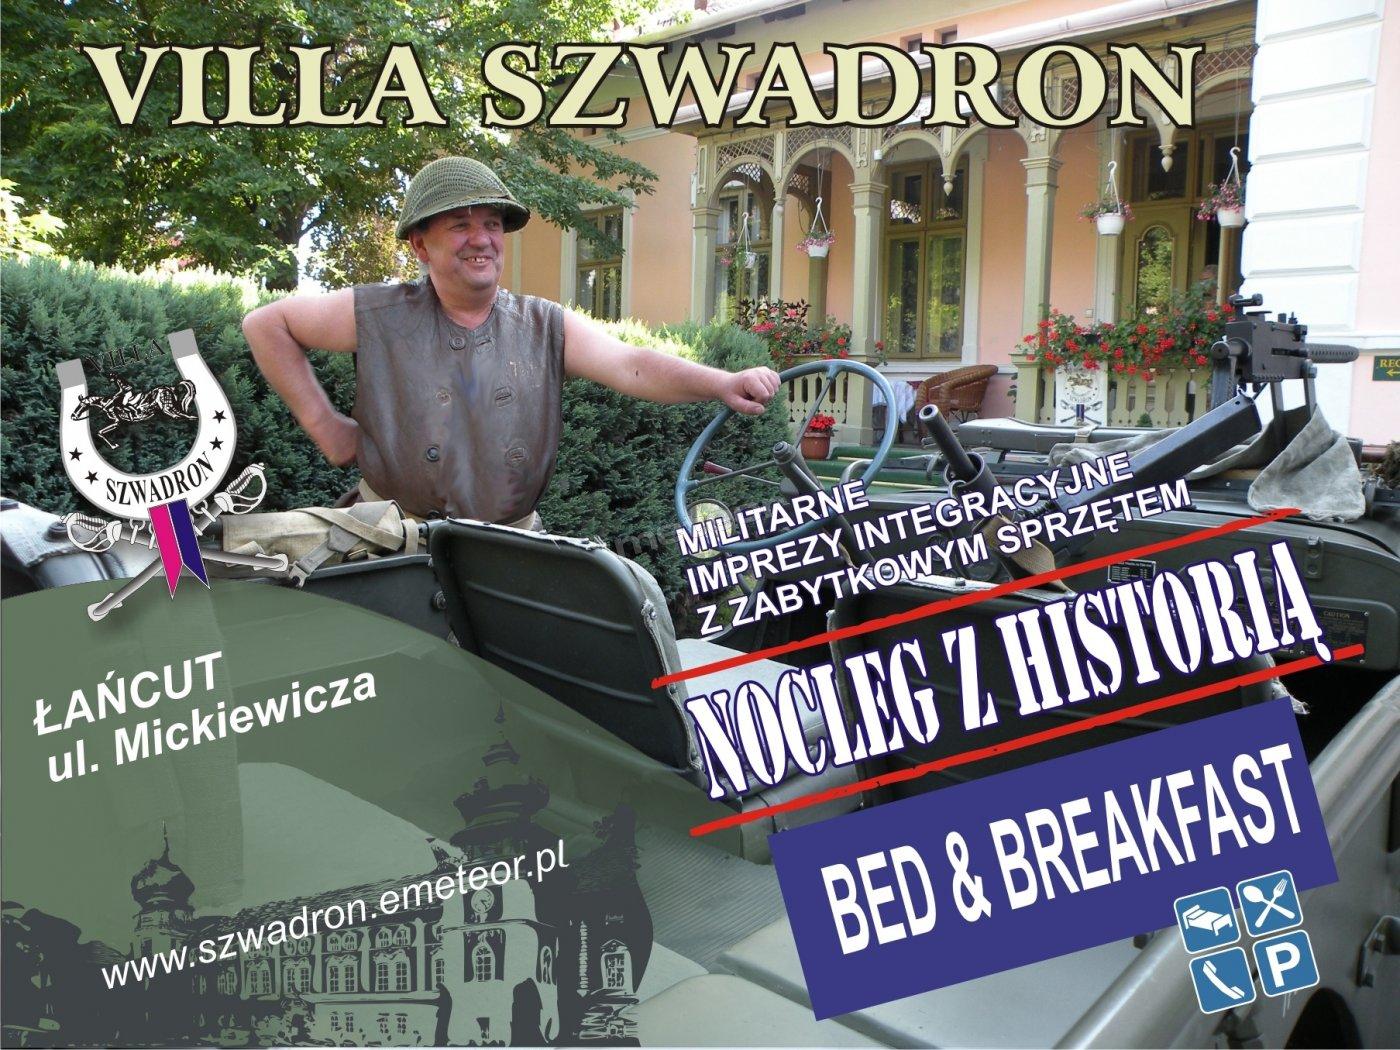 Accommodation Villa Szwadron